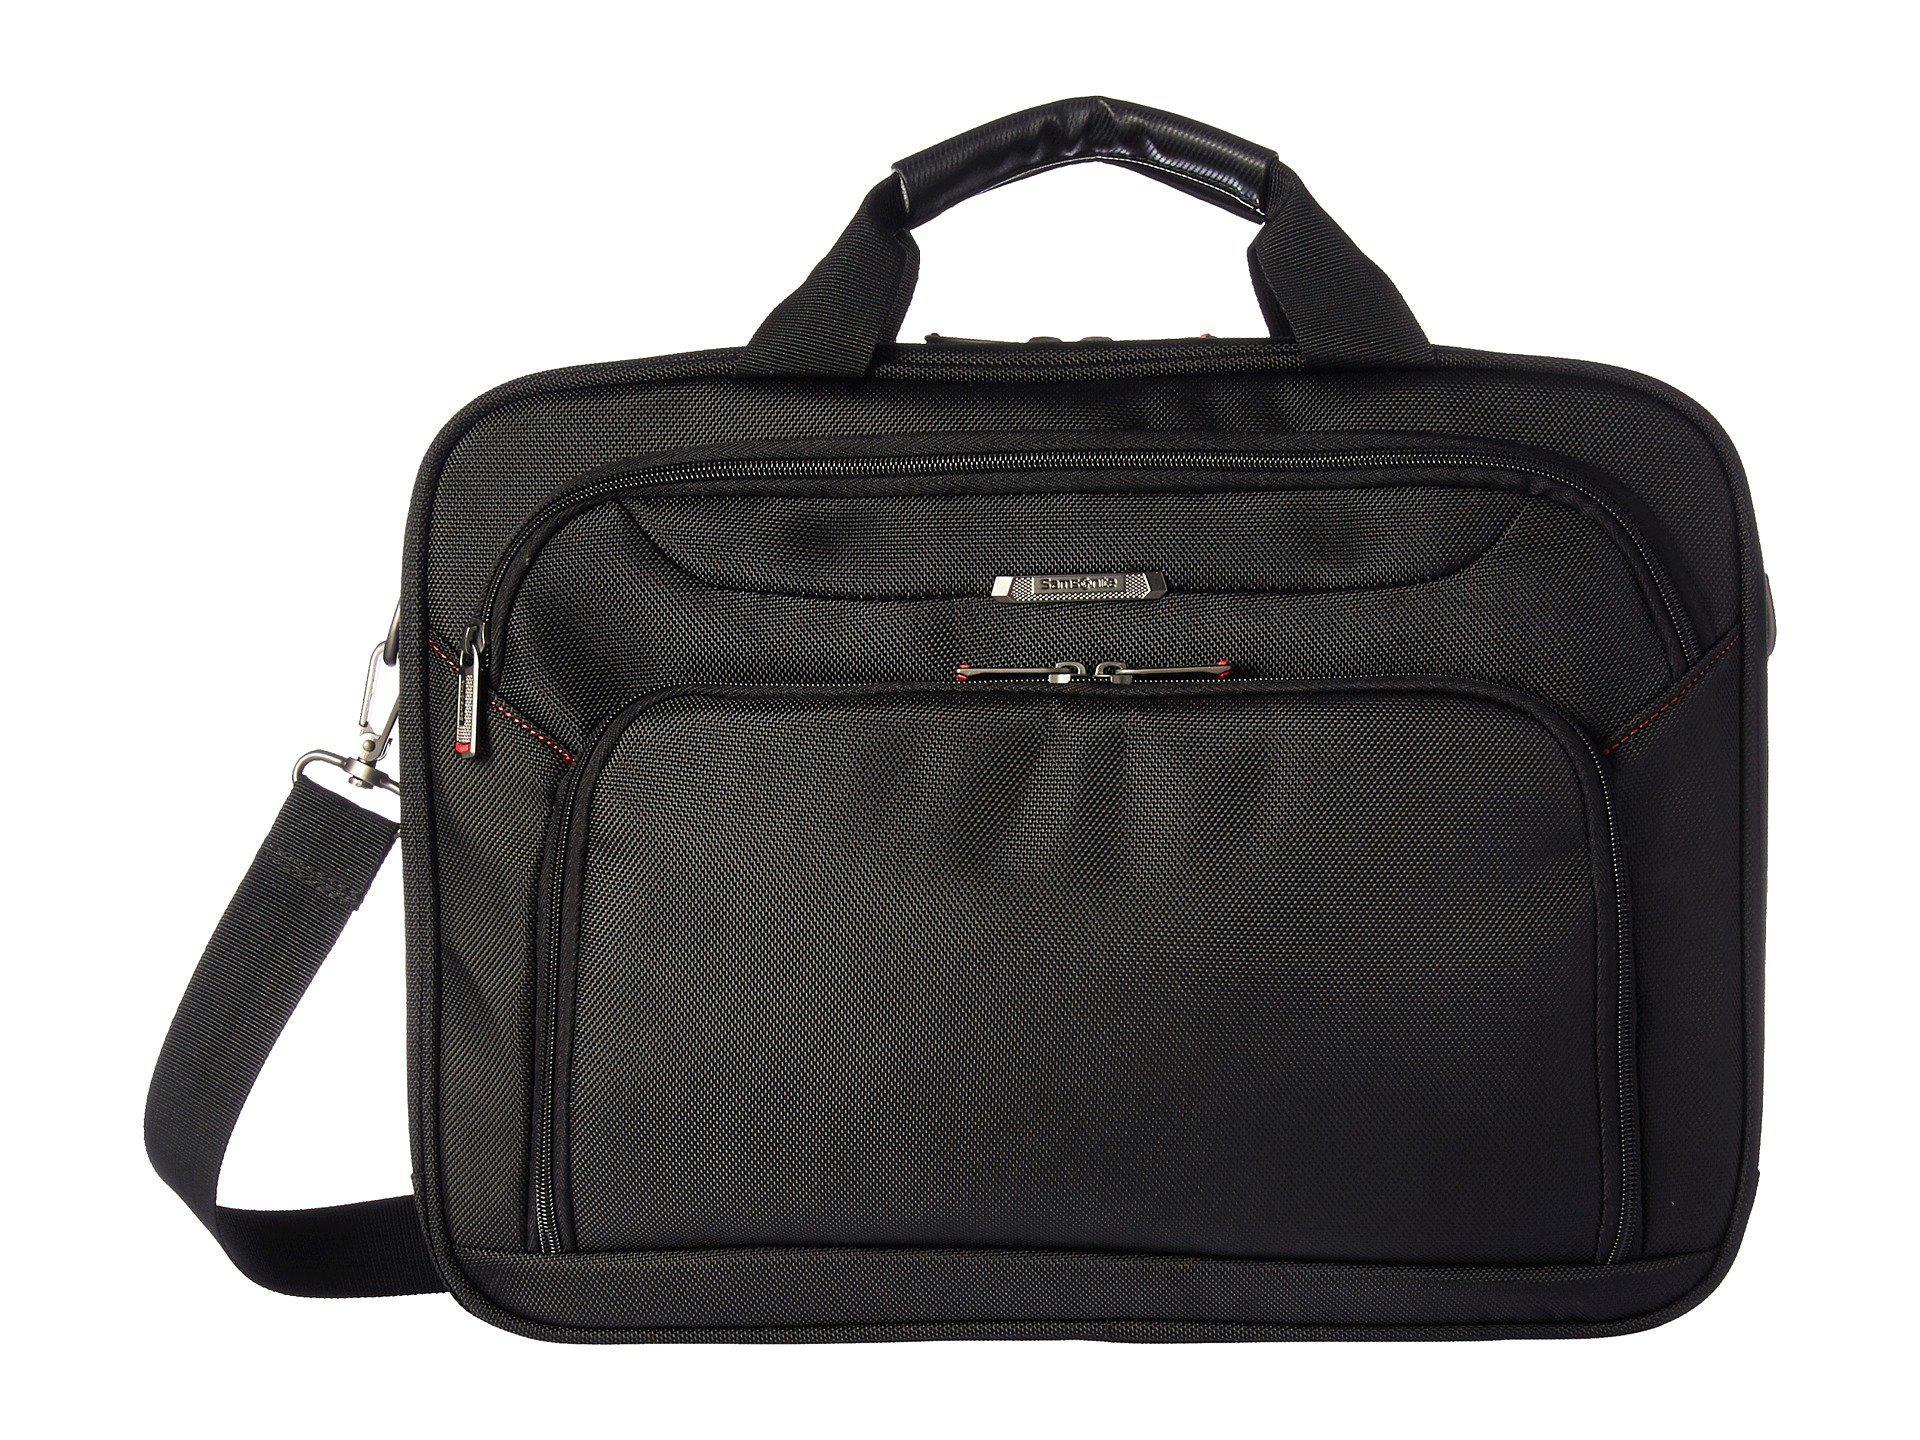 Samsonite Xenon 3 Two Gusset Brief - Checkpoint Friendly (Black) Briefcase Bags wsvt7j